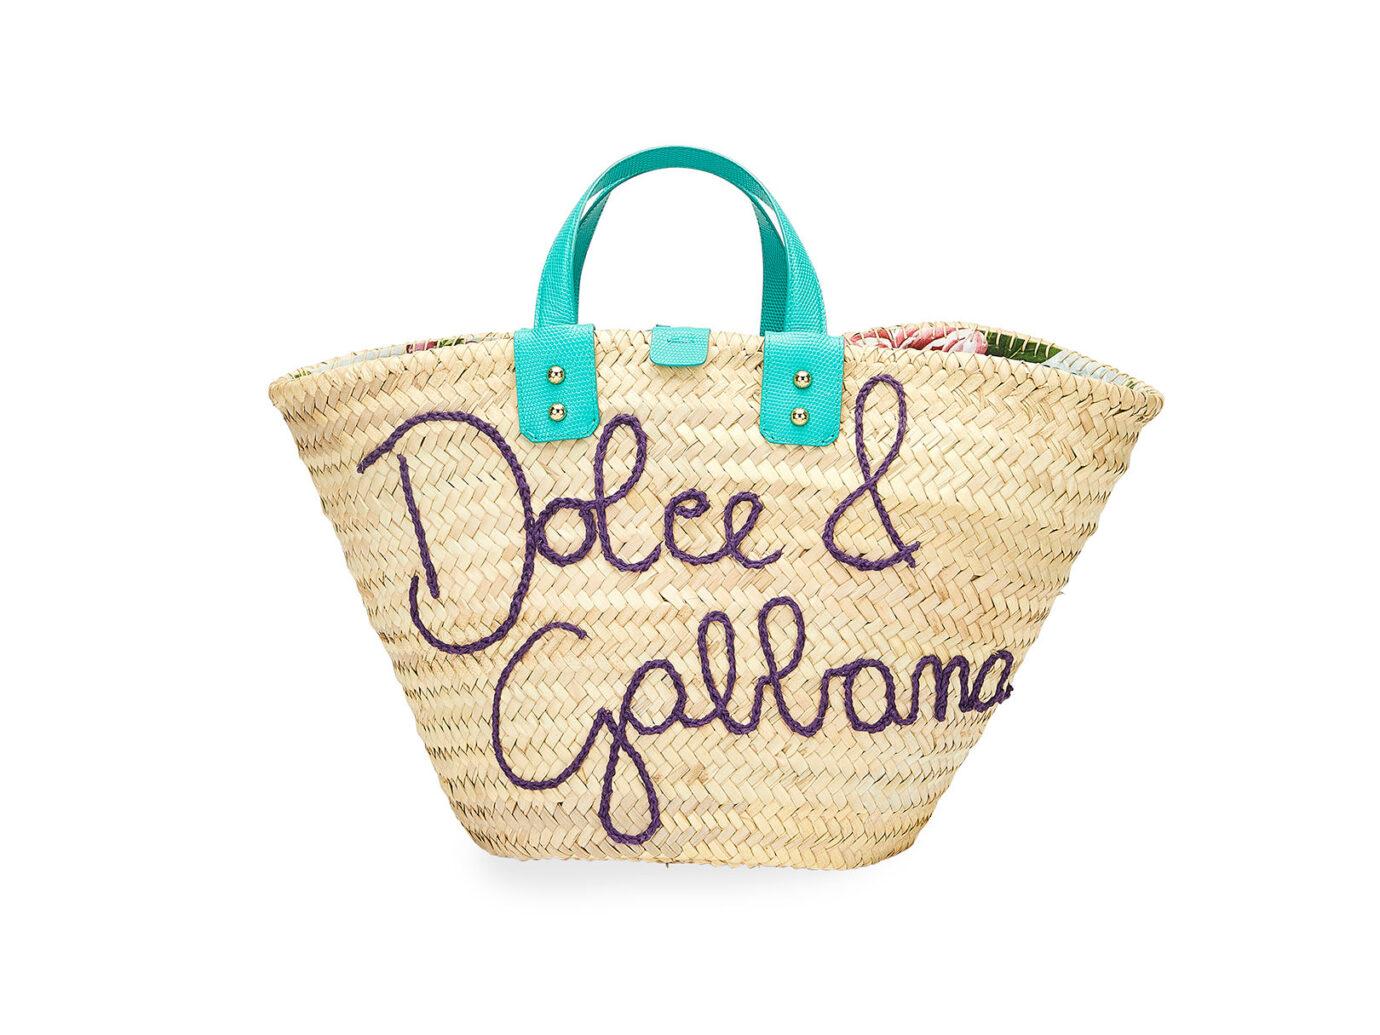 Dolce & Gabbana Kendra Tote